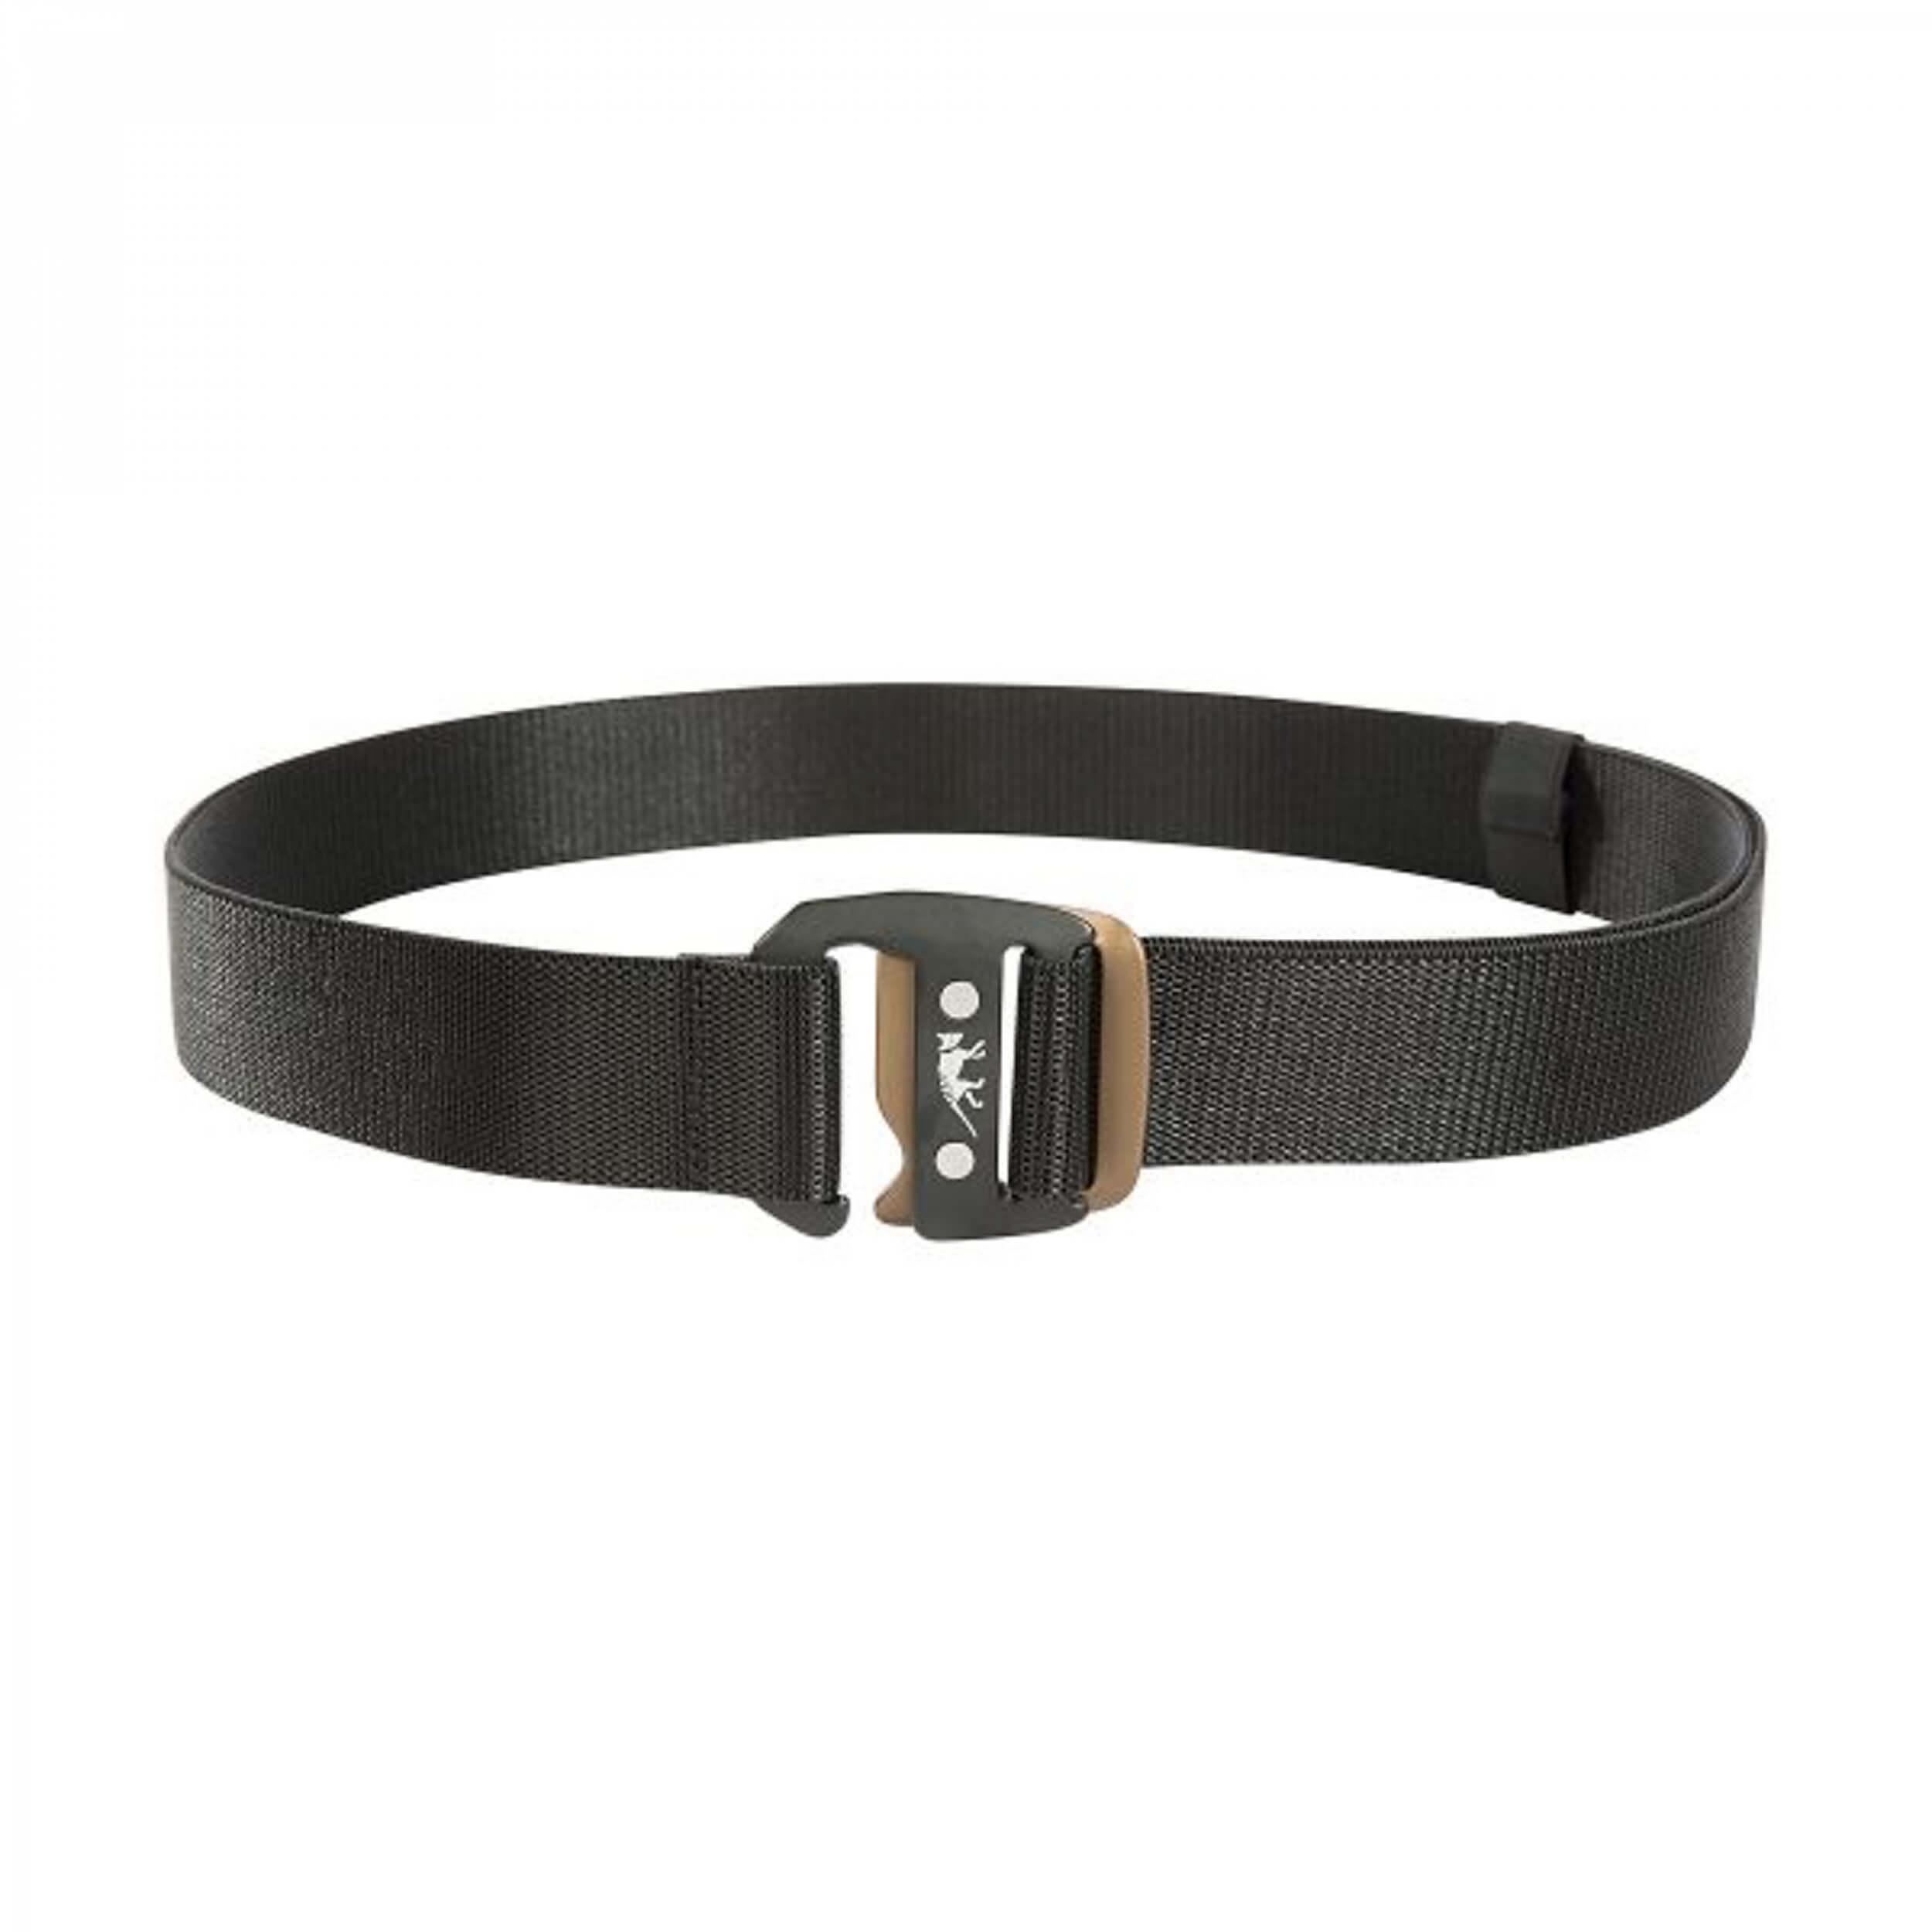 Tasmanian Tiger Stretch Belt 38mm black